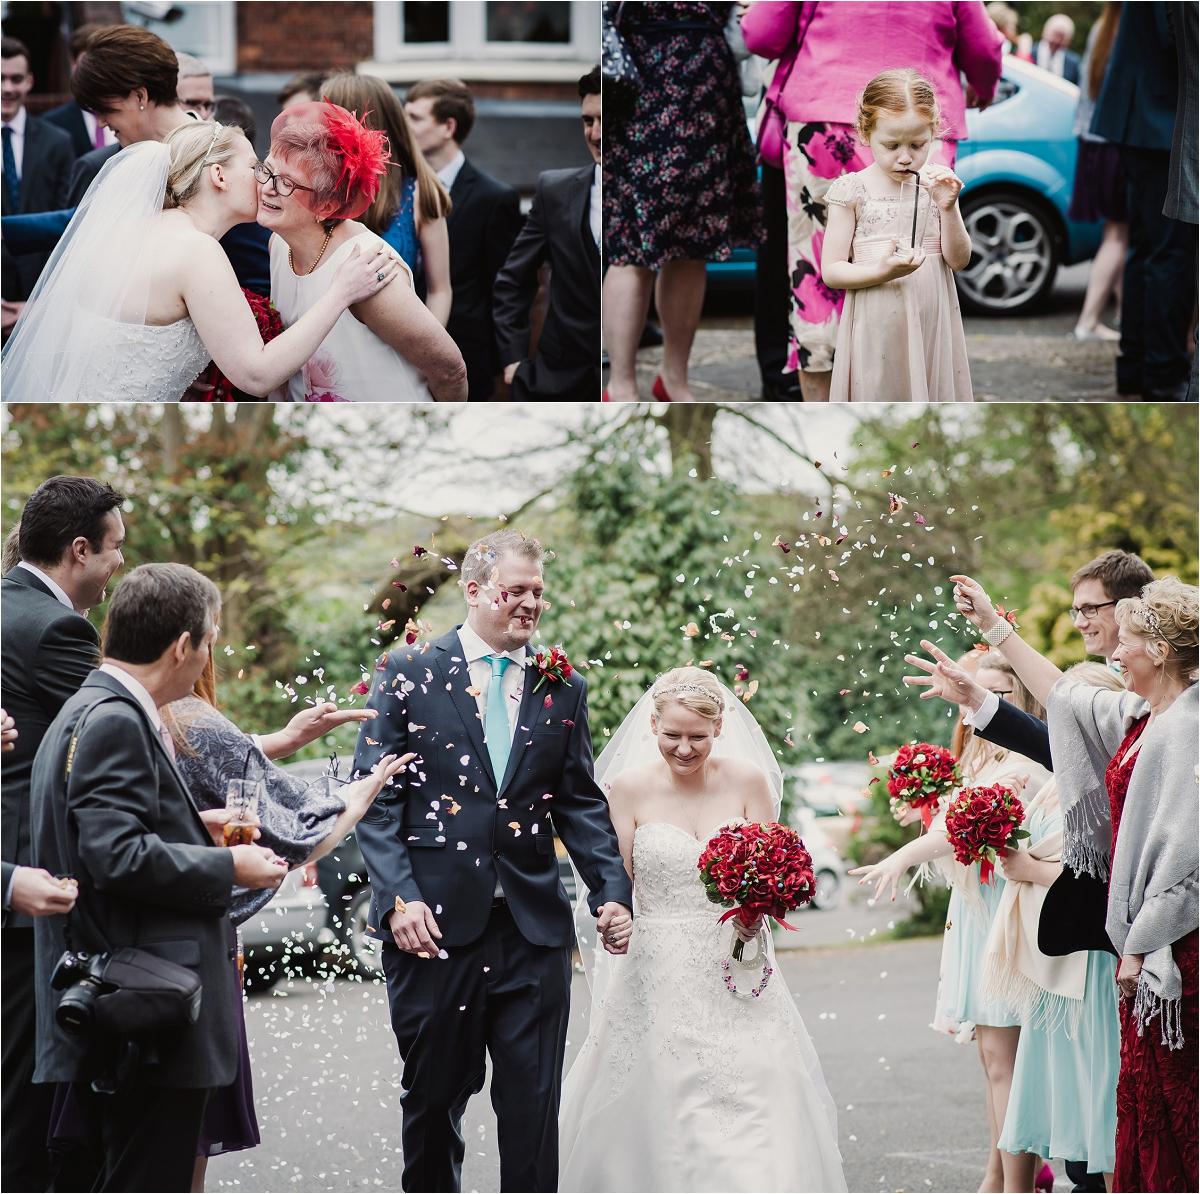 dan_emma_wedding_0018.jpg